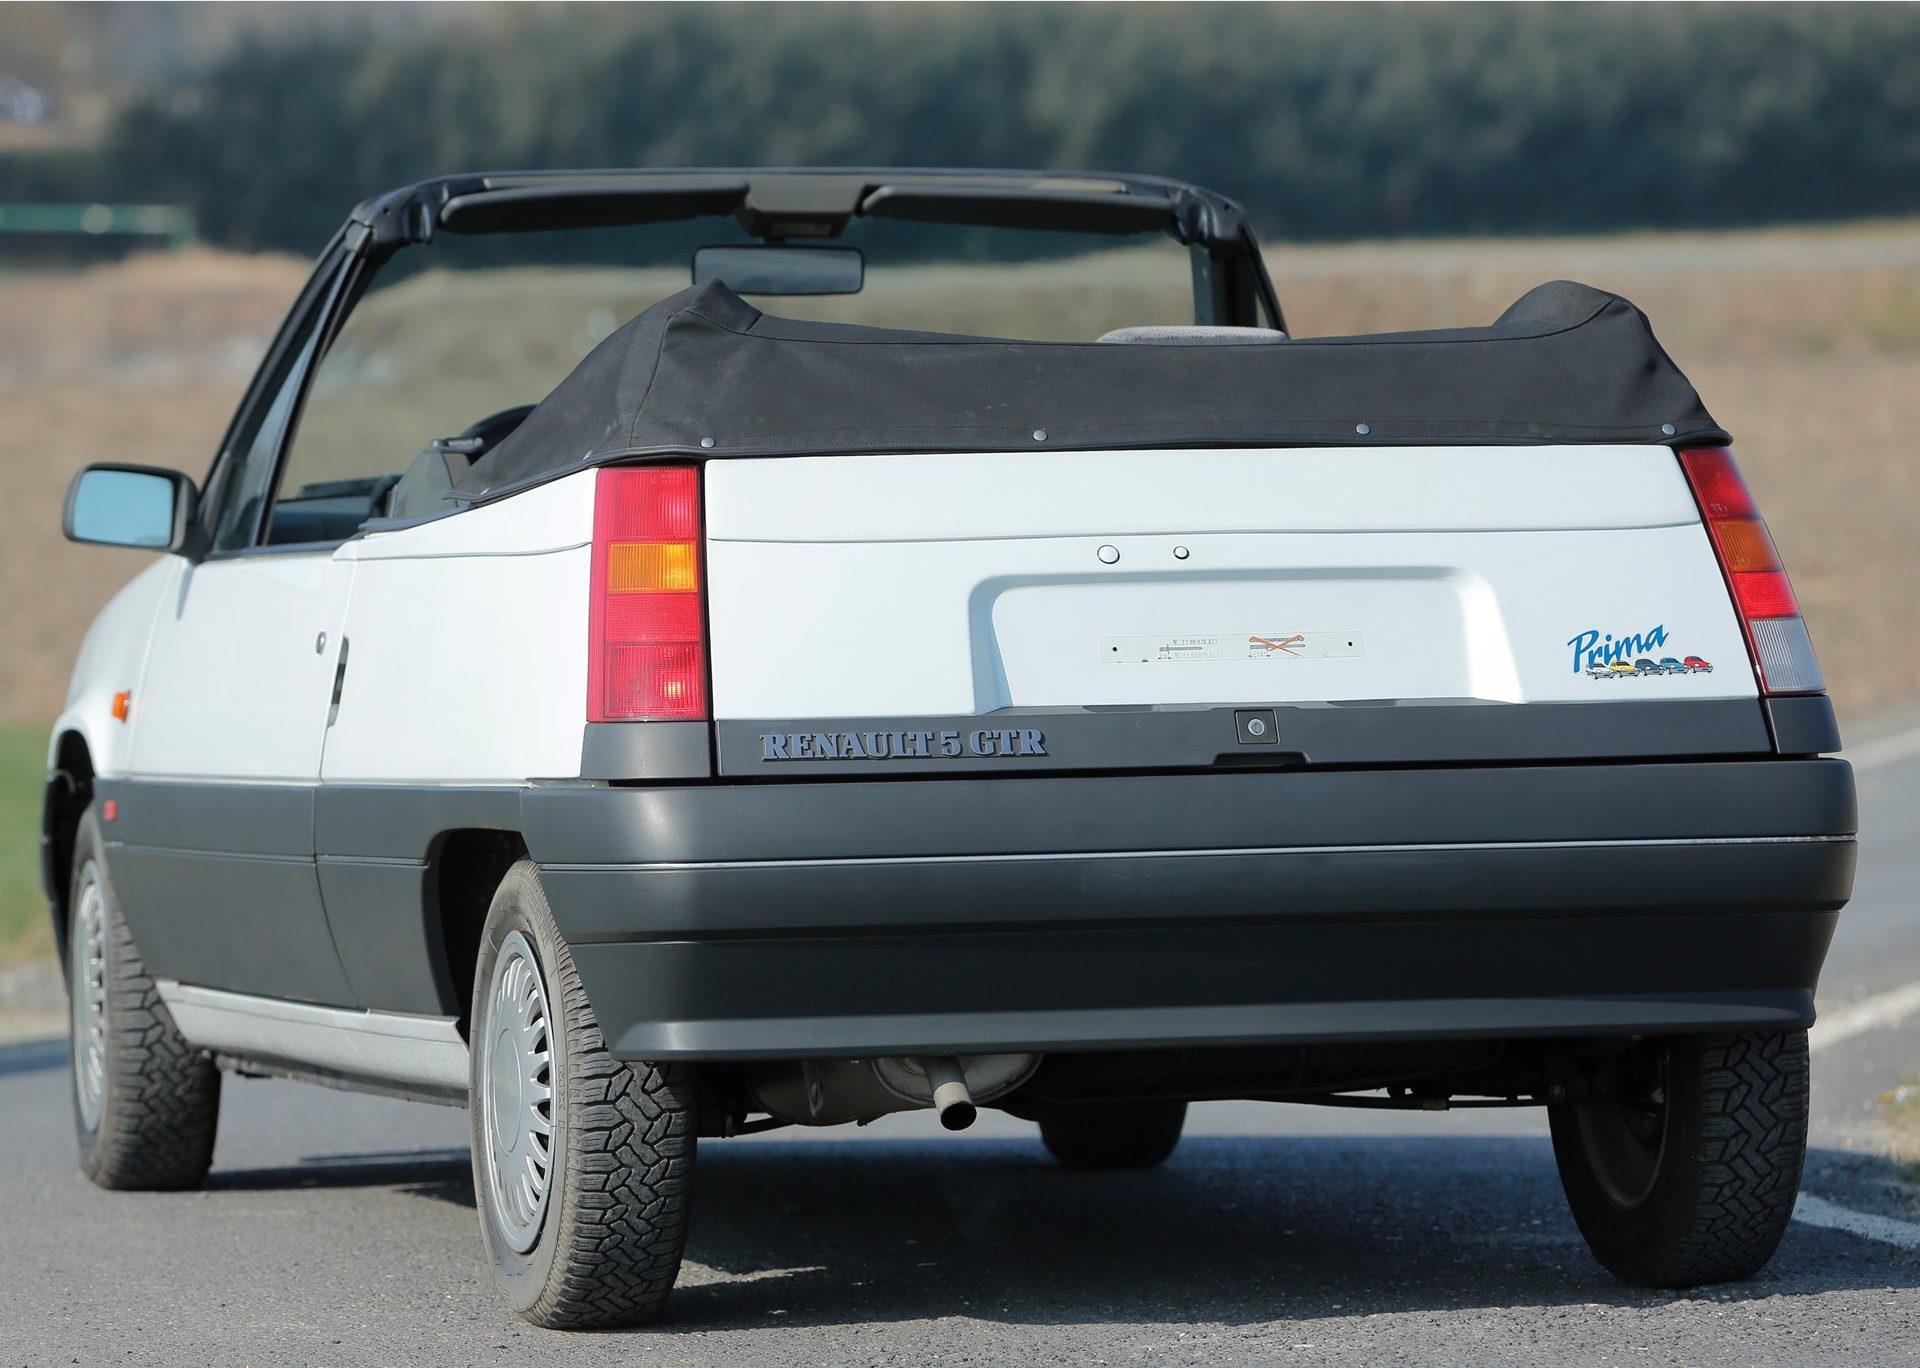 Renault 5 GTR Cabriolet